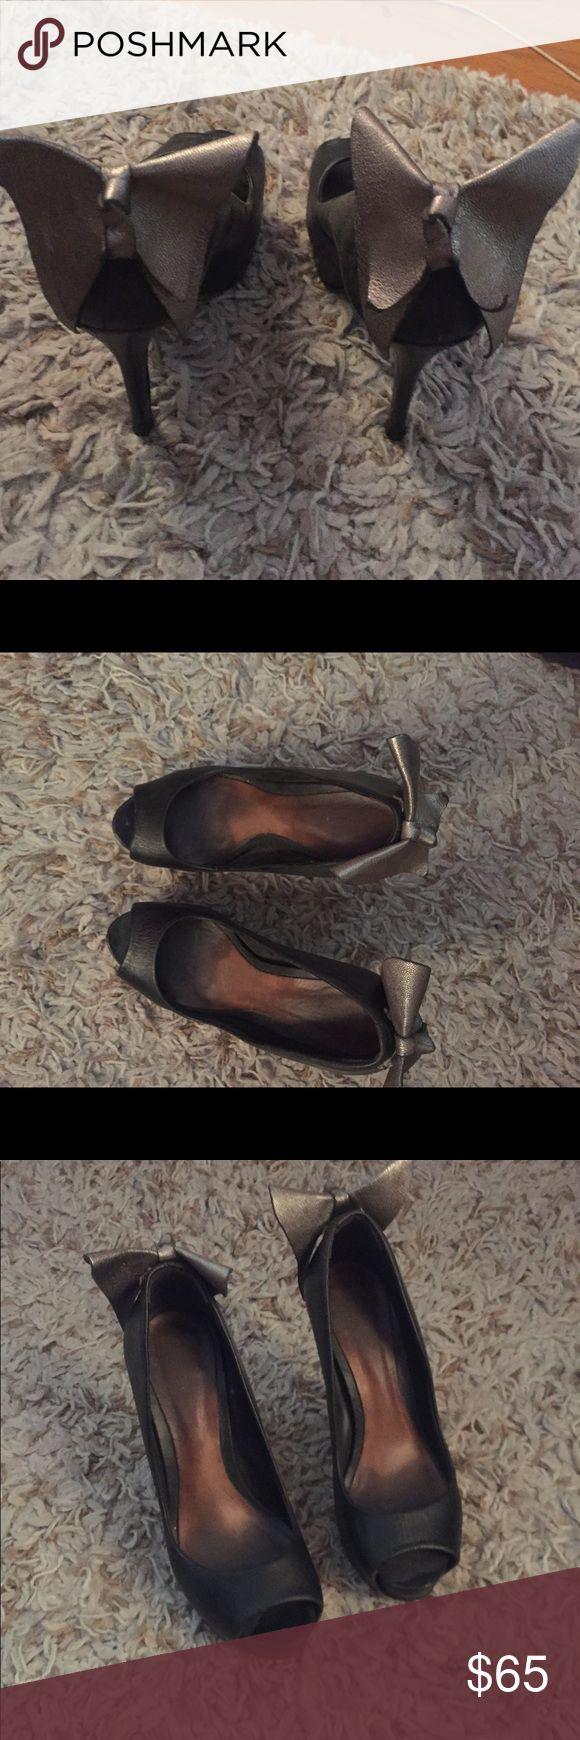 Black peep toe pumps Black peep toe Aldo pumps with silver bow detail on the back. Aldo Shoes Heels